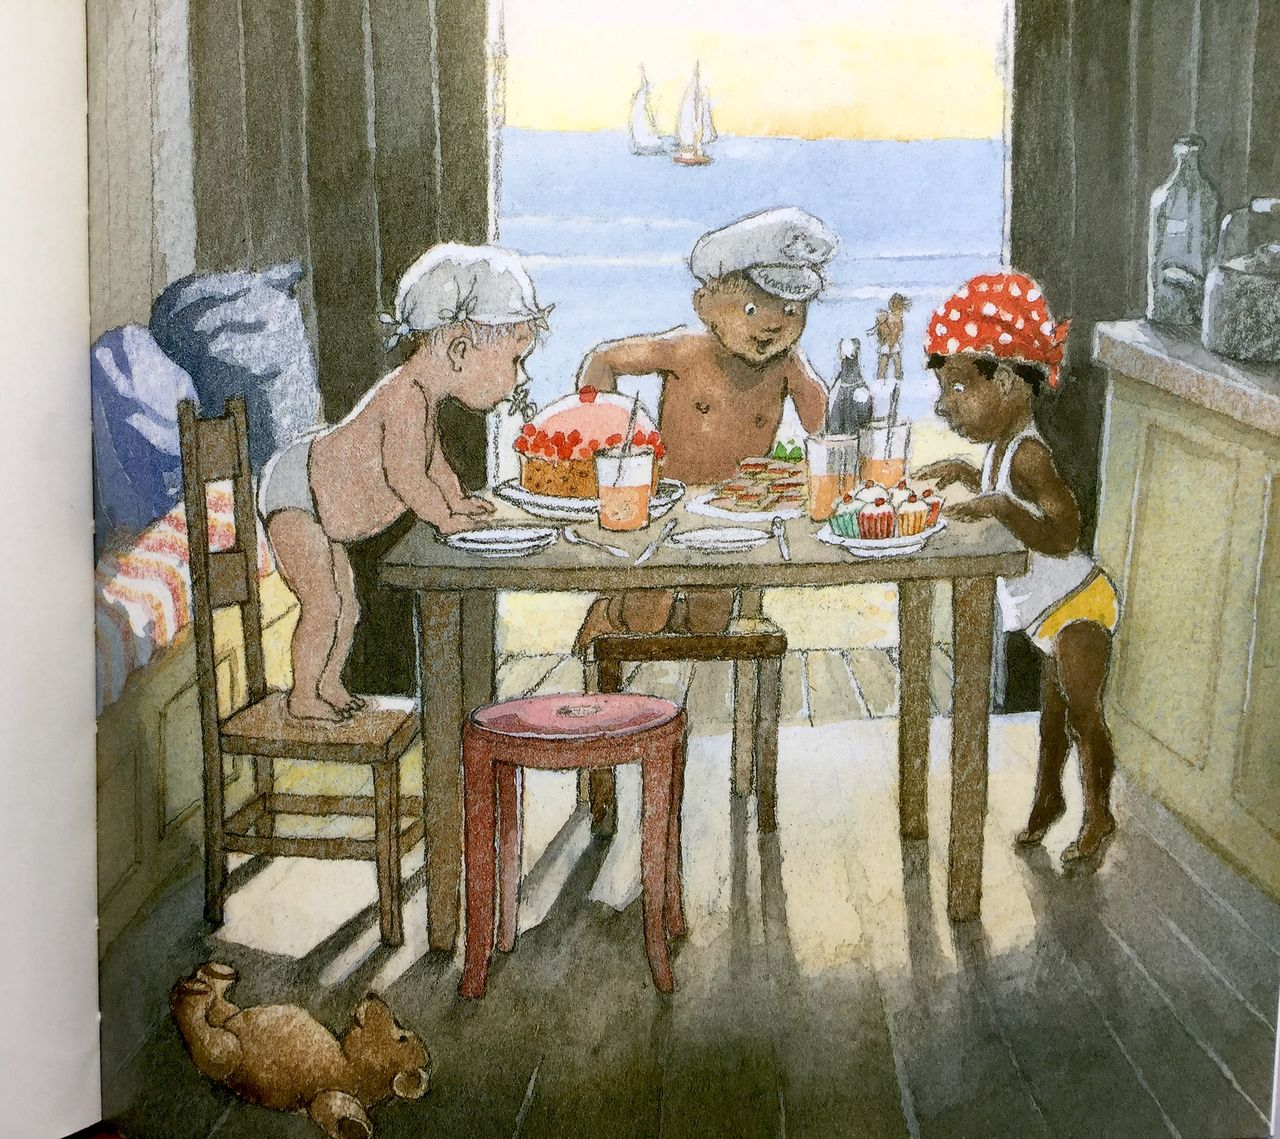 Bently Oxenbury, Tre piccoli pirati, Mondadori